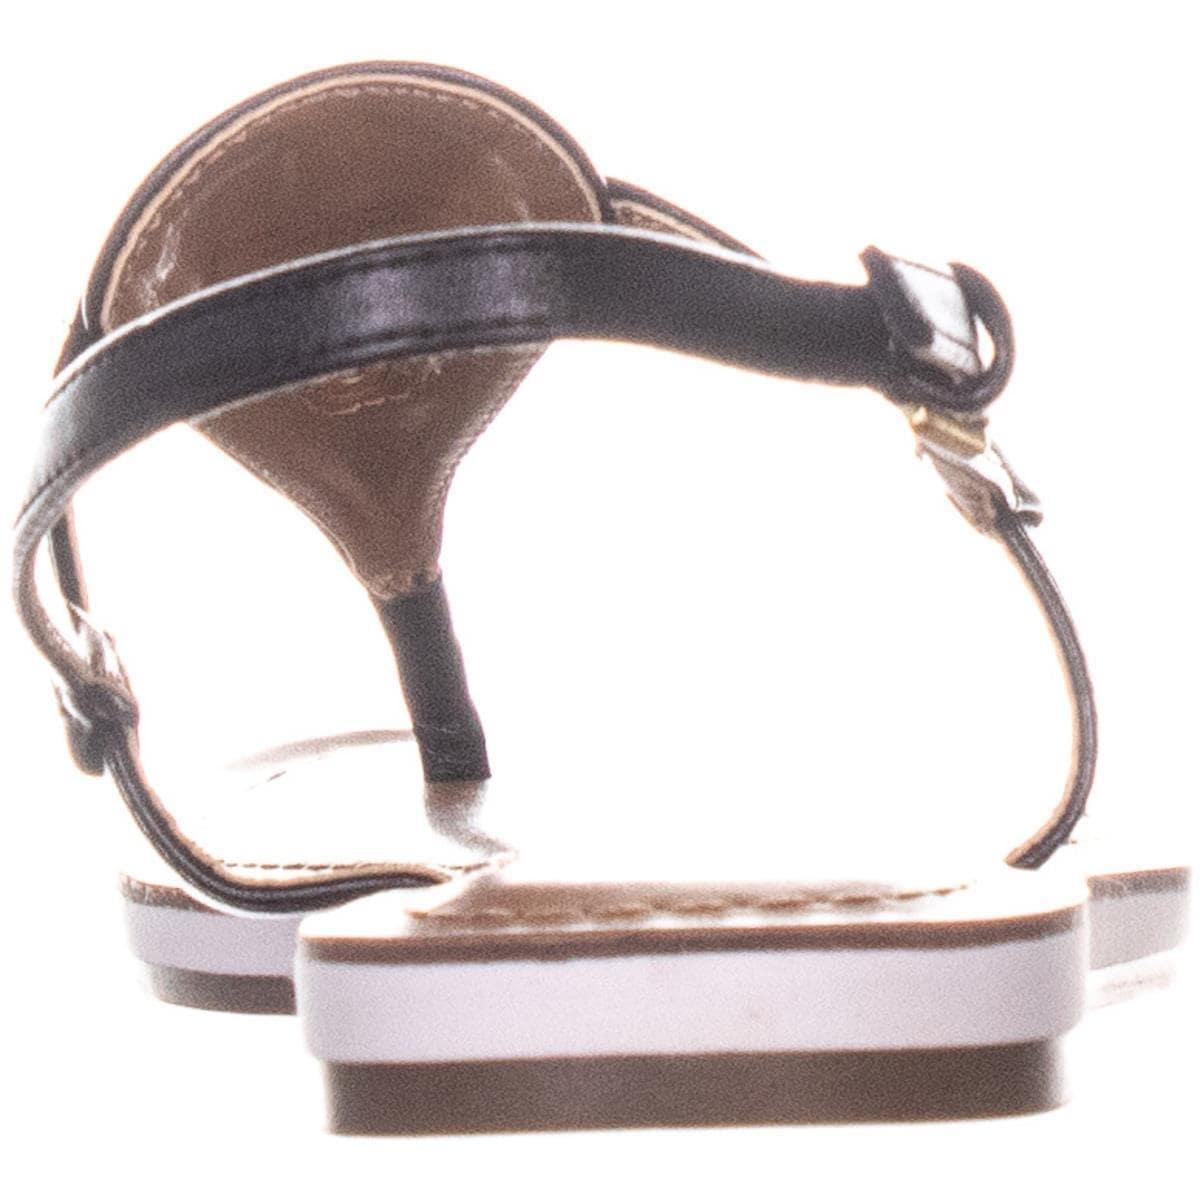 cf4e89233 Shop Tommy Hilfiger Genei Sling Back Flat Sandals